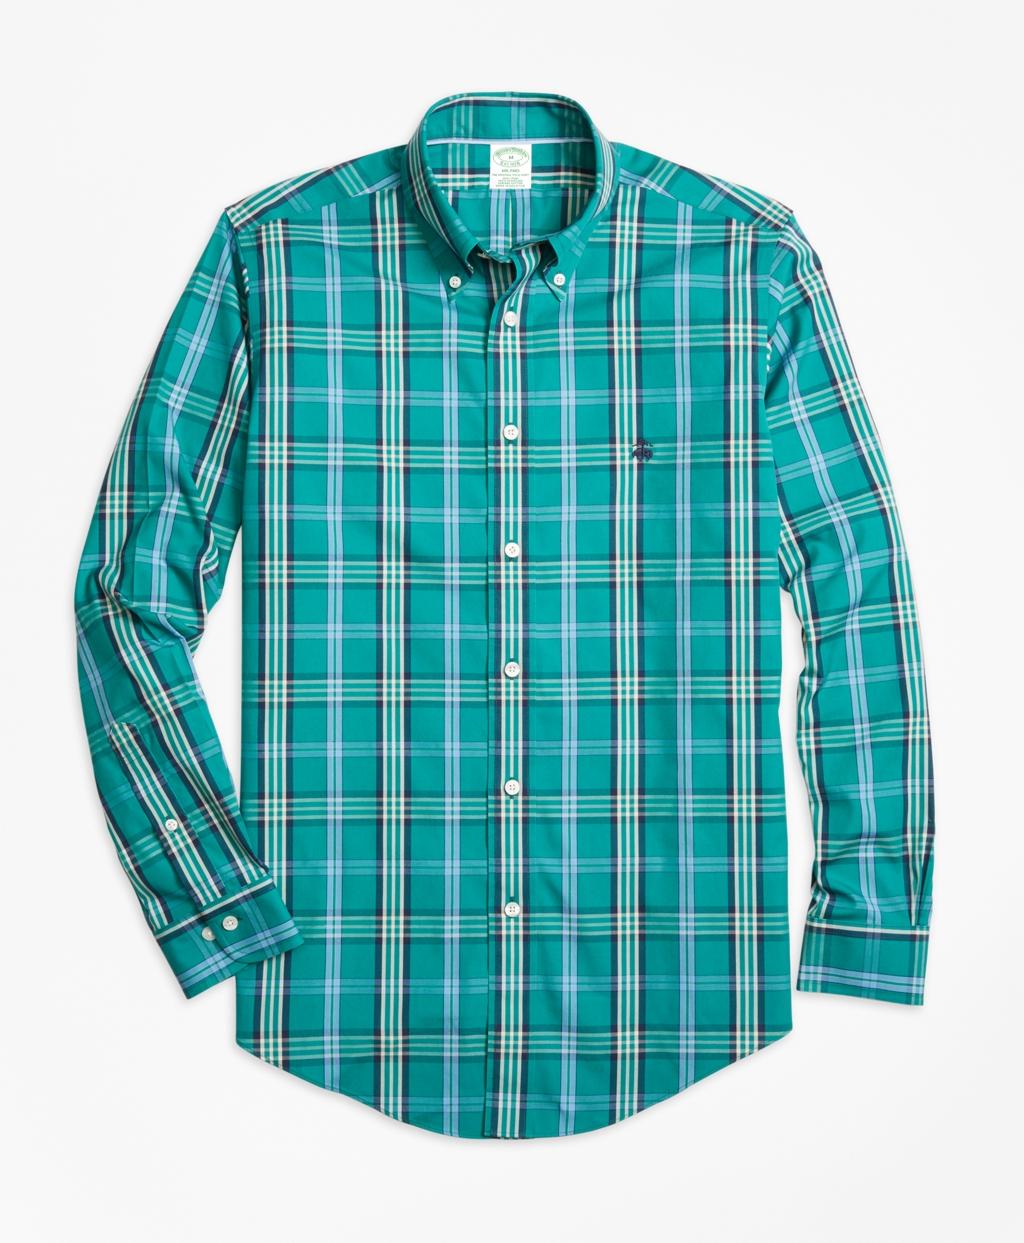 Brooks brothers non iron milano fit signature tartan sport for Brooks brothers sports shirts